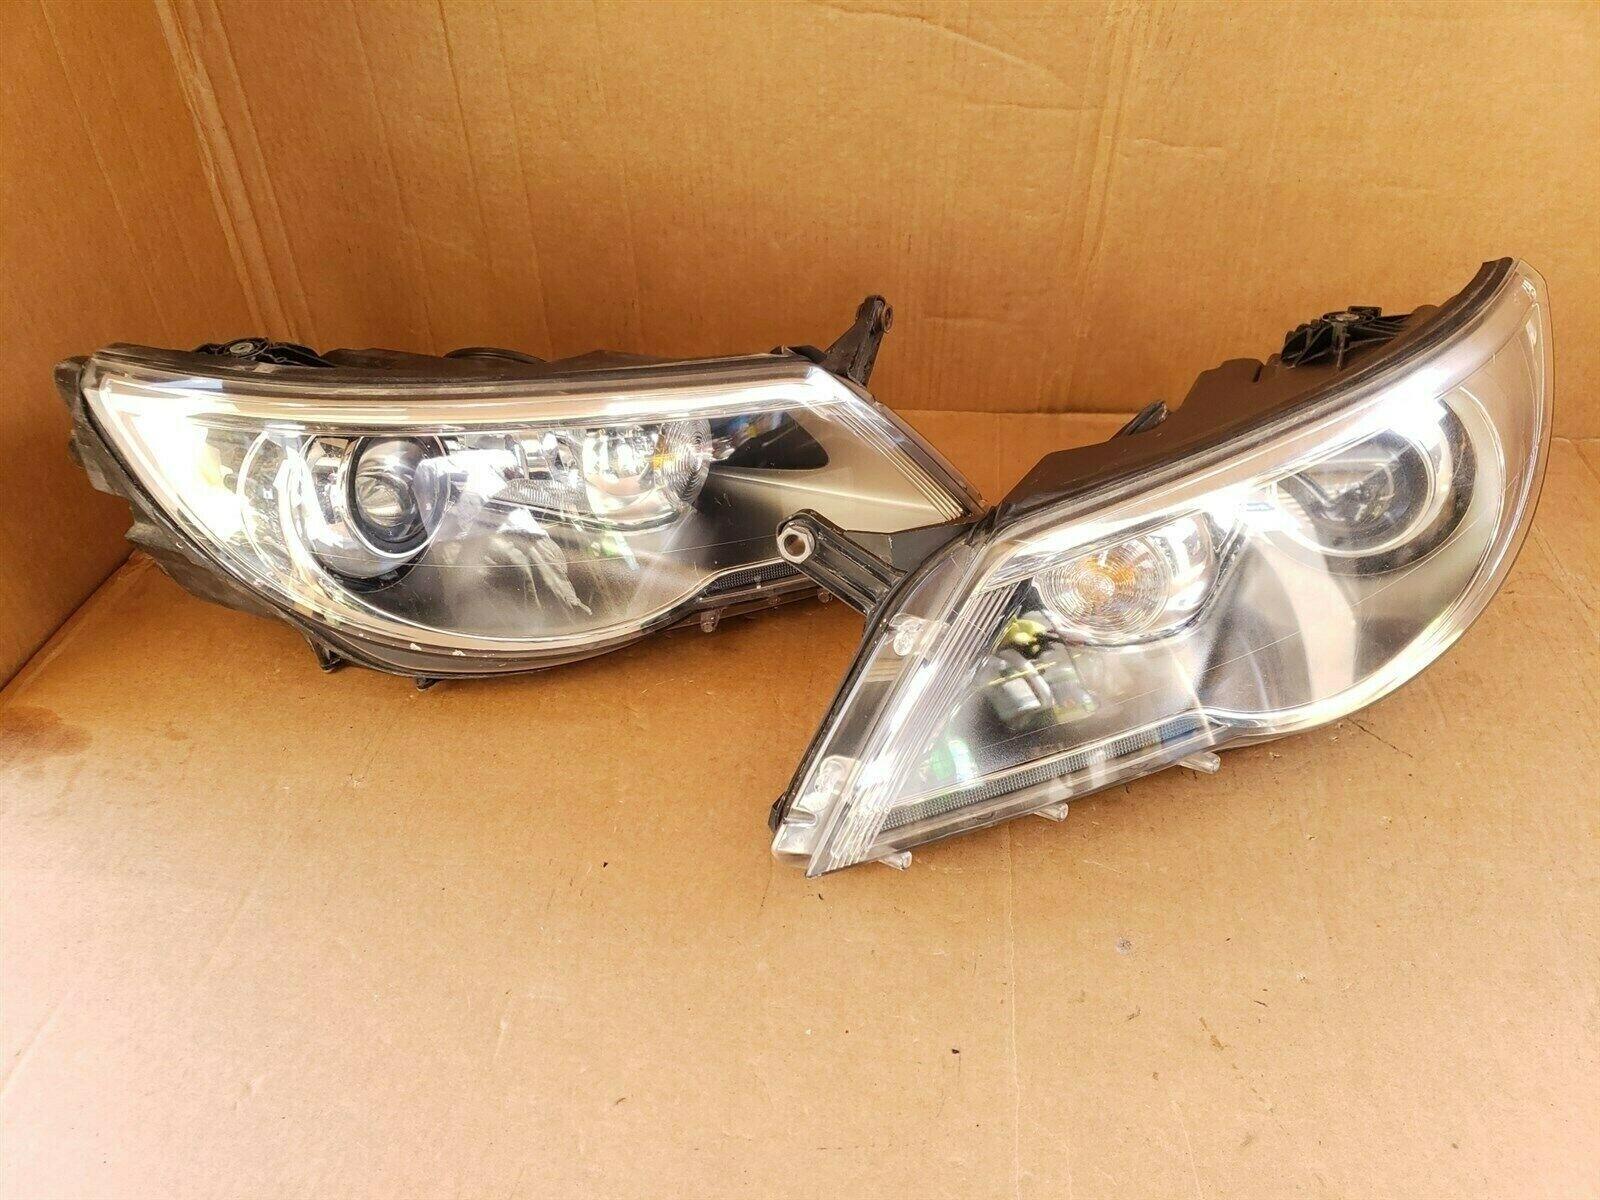 09-11 Volkswagen VW Tiguan Headlight Xenon HID AFS Set L&R